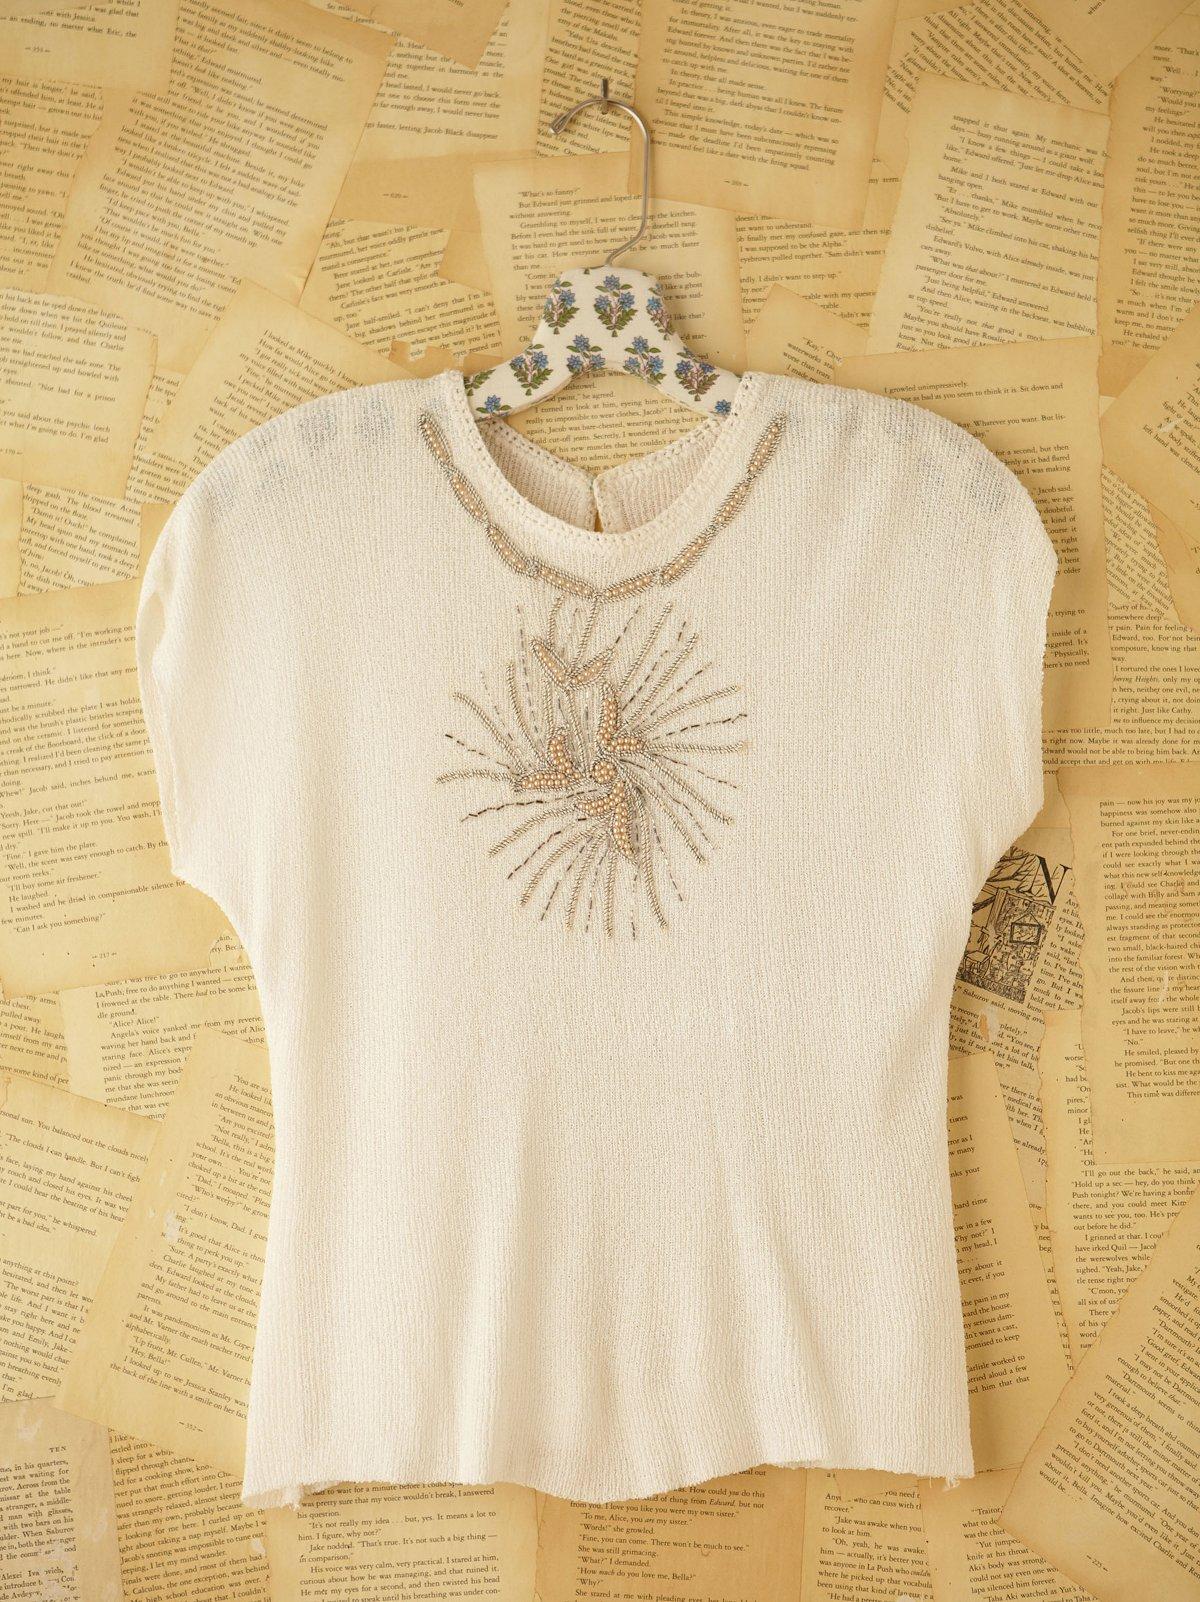 Vintage Boucle Short Sleeve Top